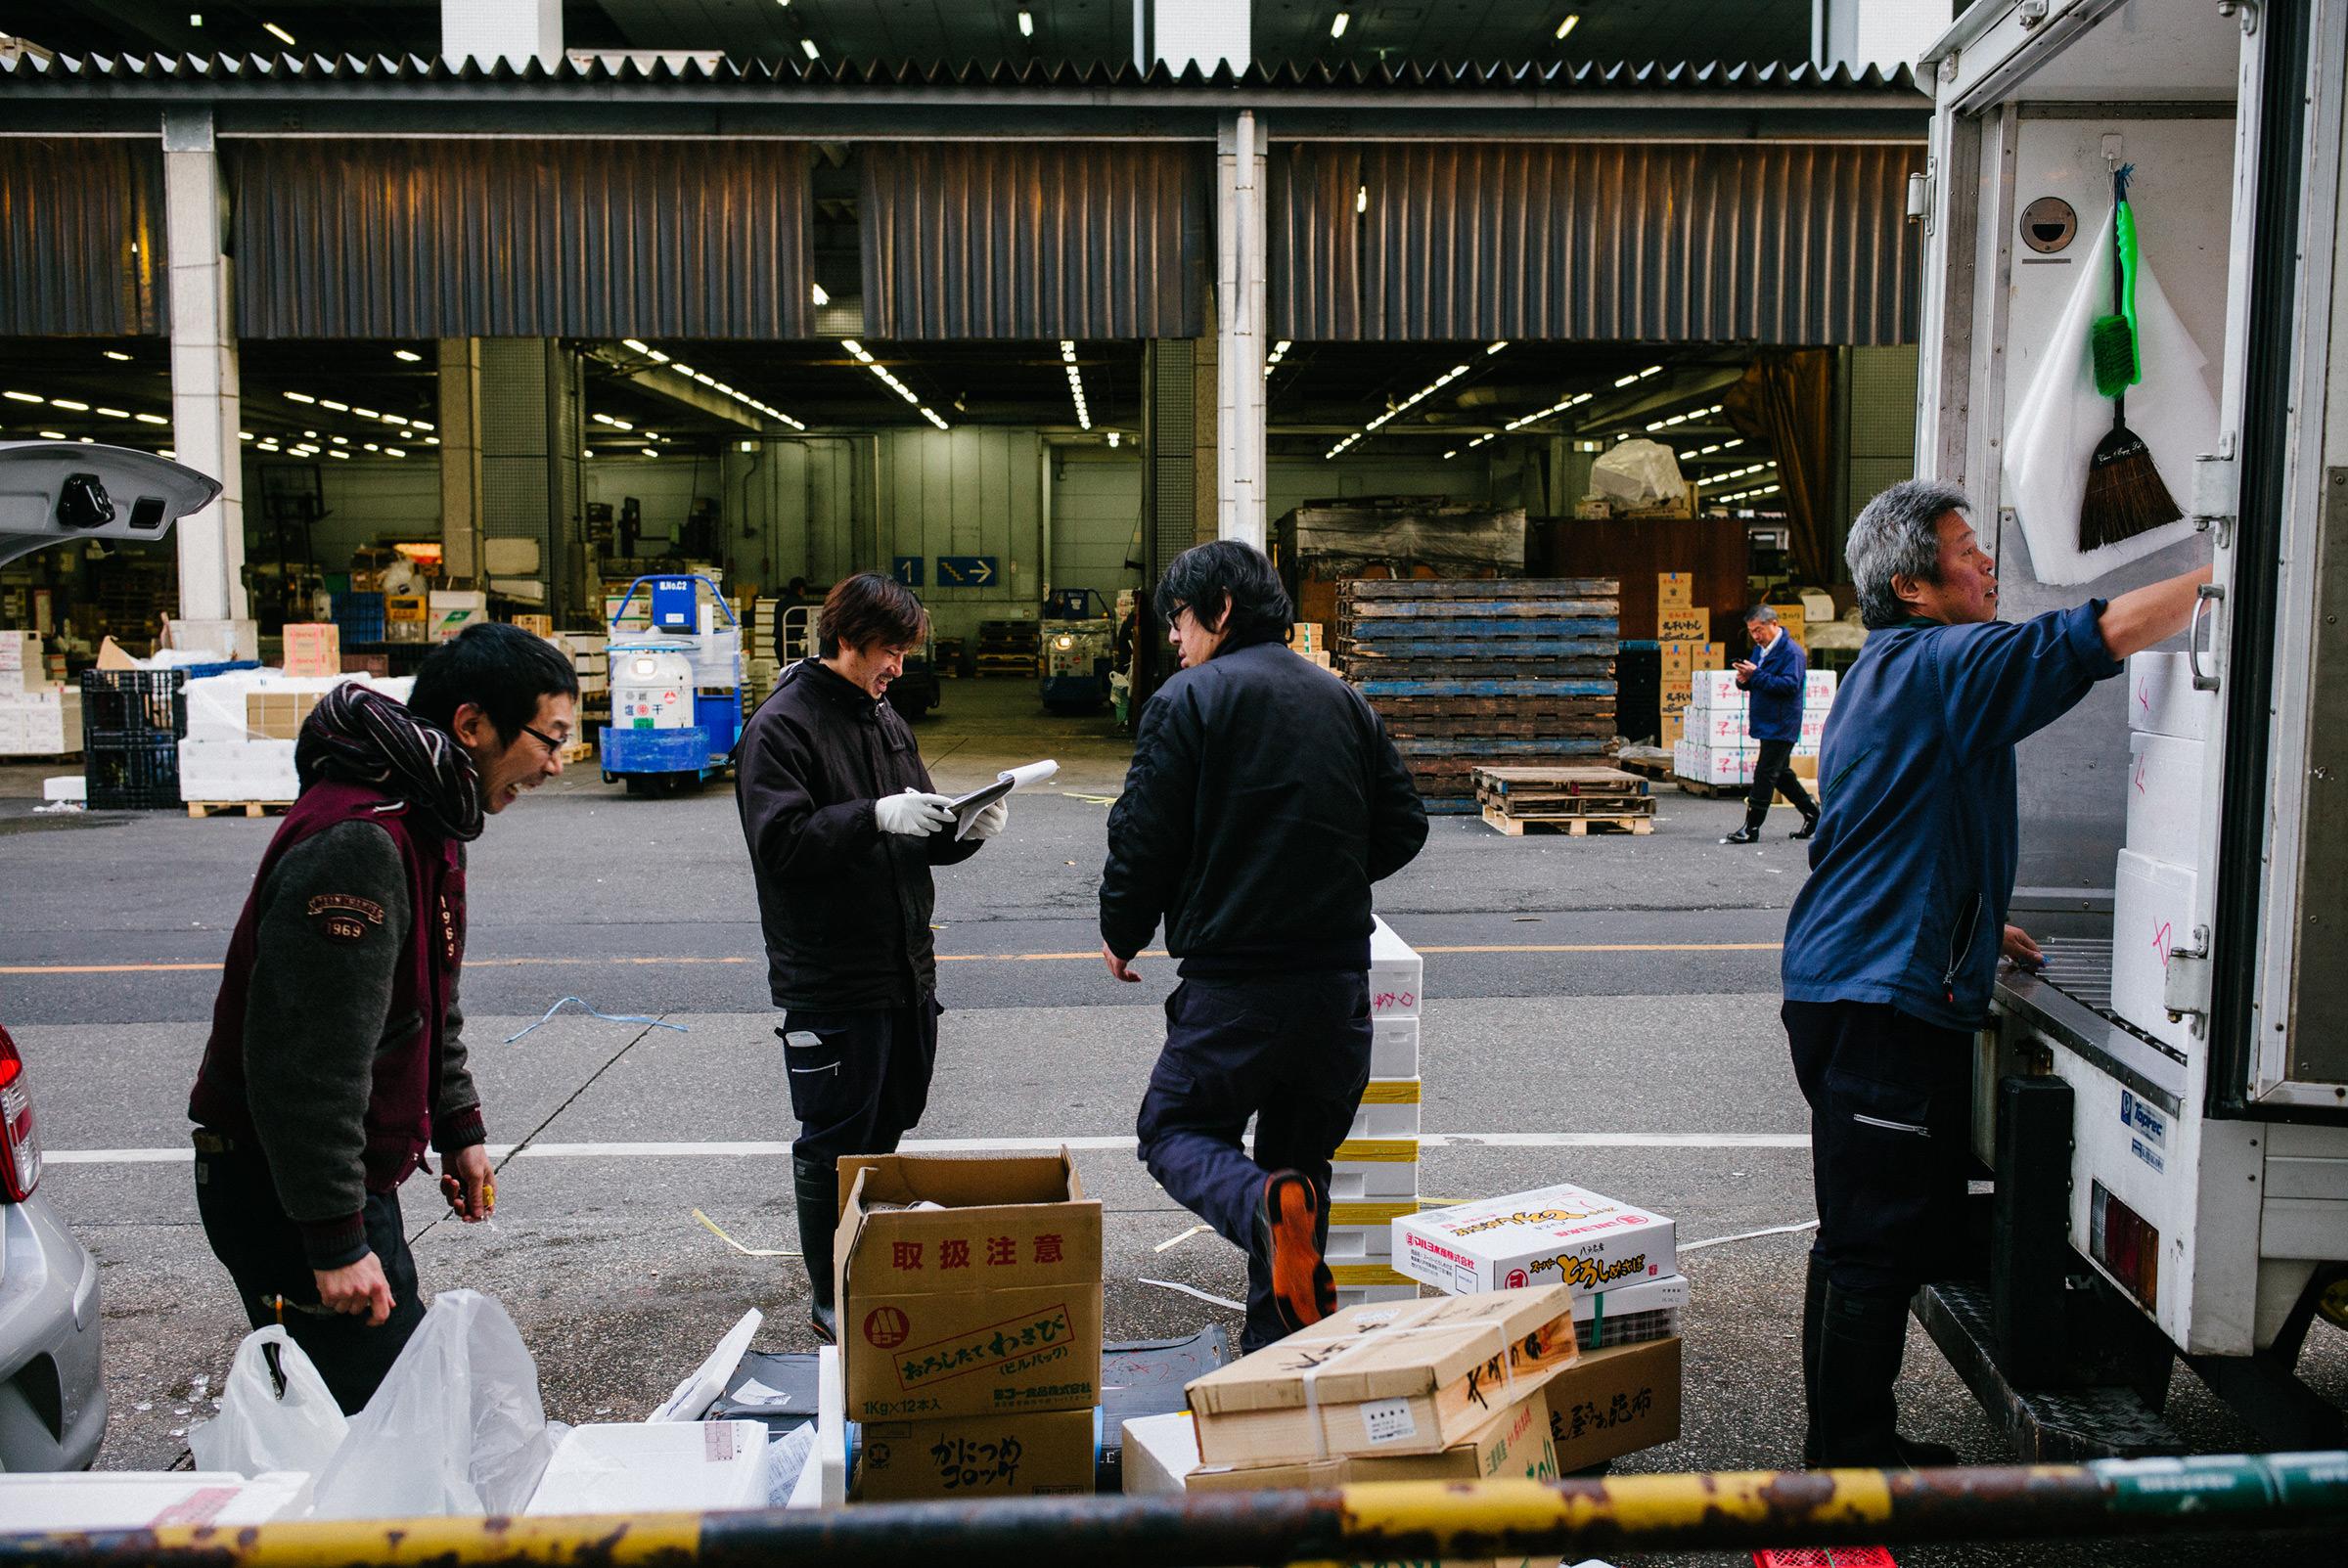 brandon_patoc_travel_japan_worldwide_photographer0005.jpg